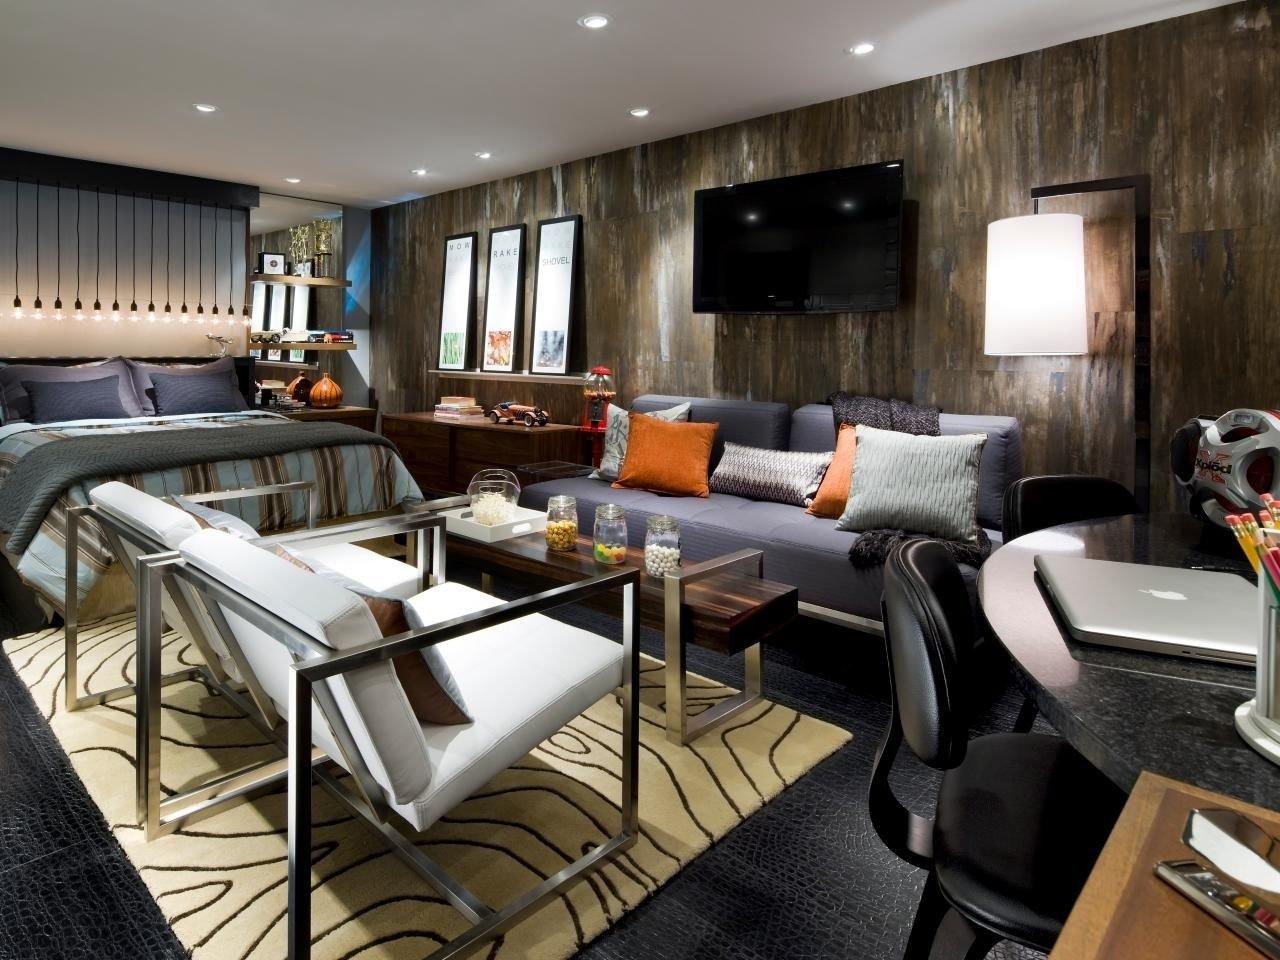 10 Beautiful Cool Room Ideas For Teenage Guys bedrooms alluring cool boys rooms little boys room boys bedroom cool 2020